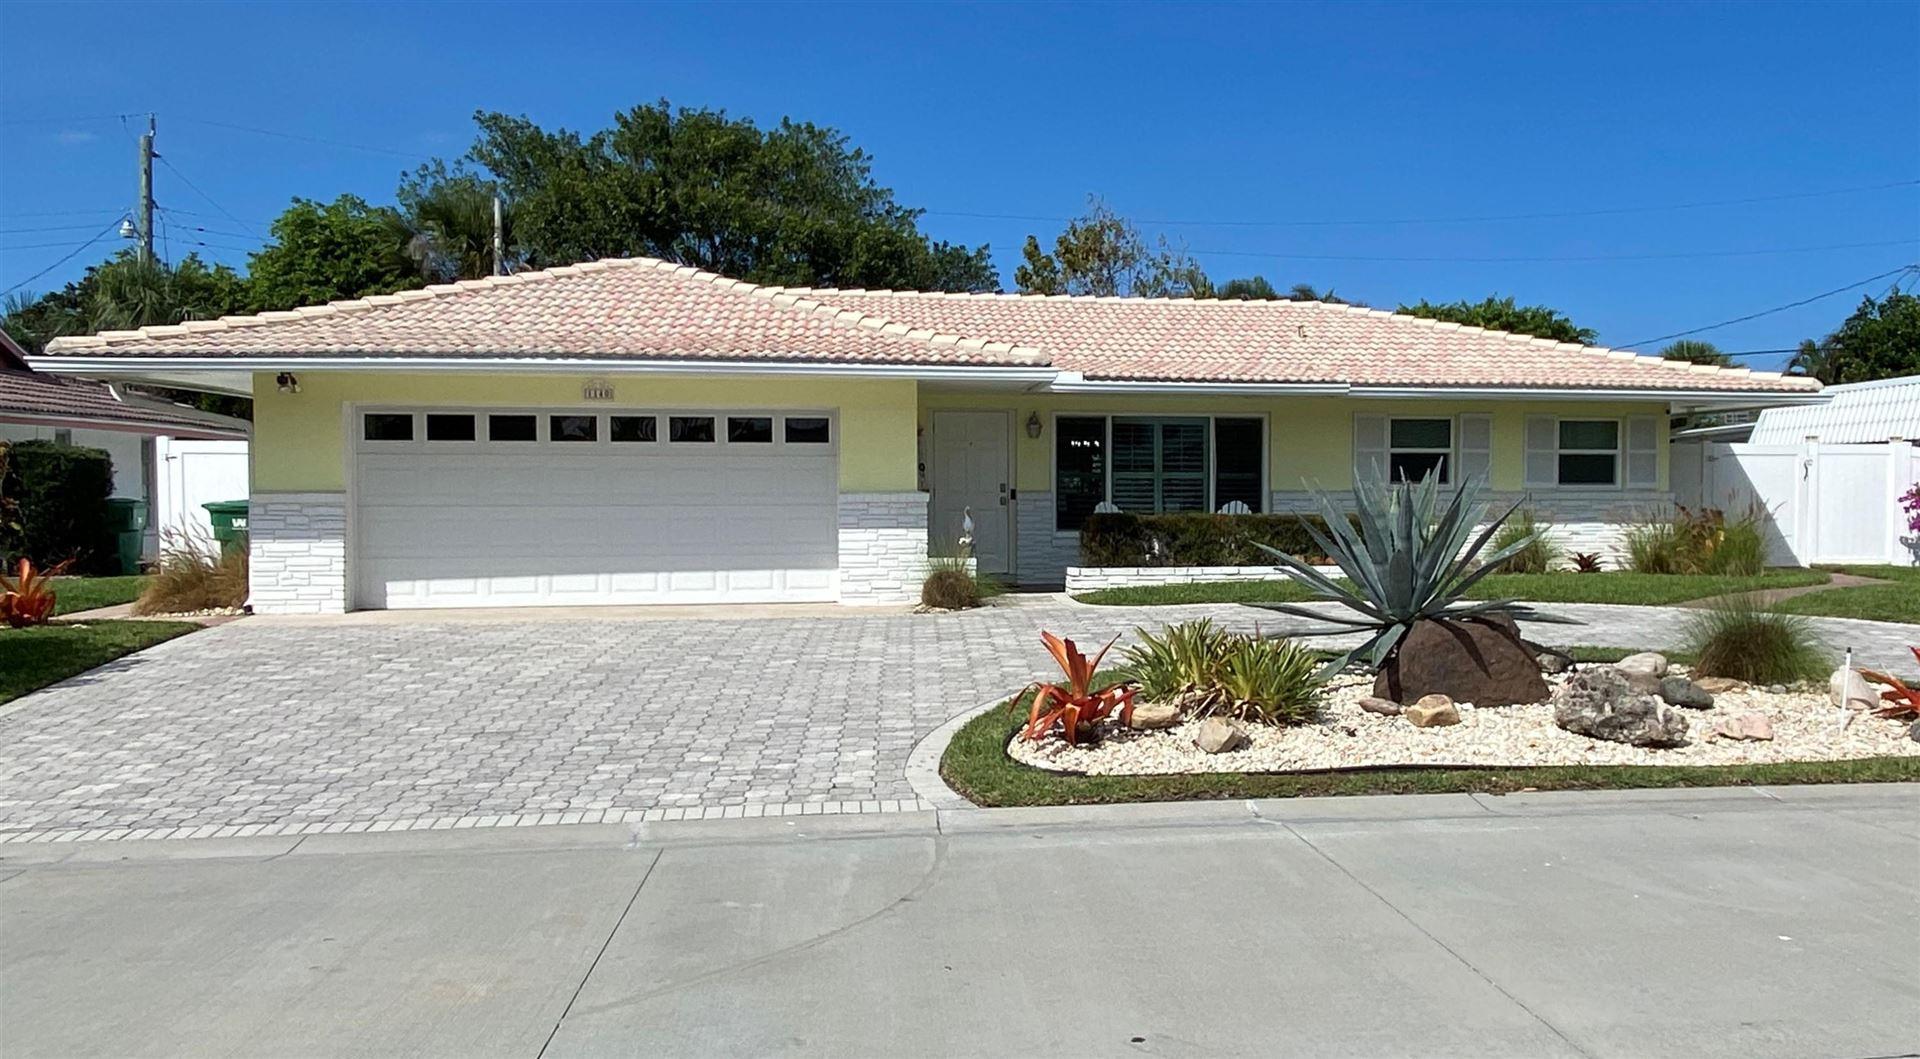 Photo of 1140 Singer Drive, Riviera Beach, FL 33404 (MLS # RX-10694442)